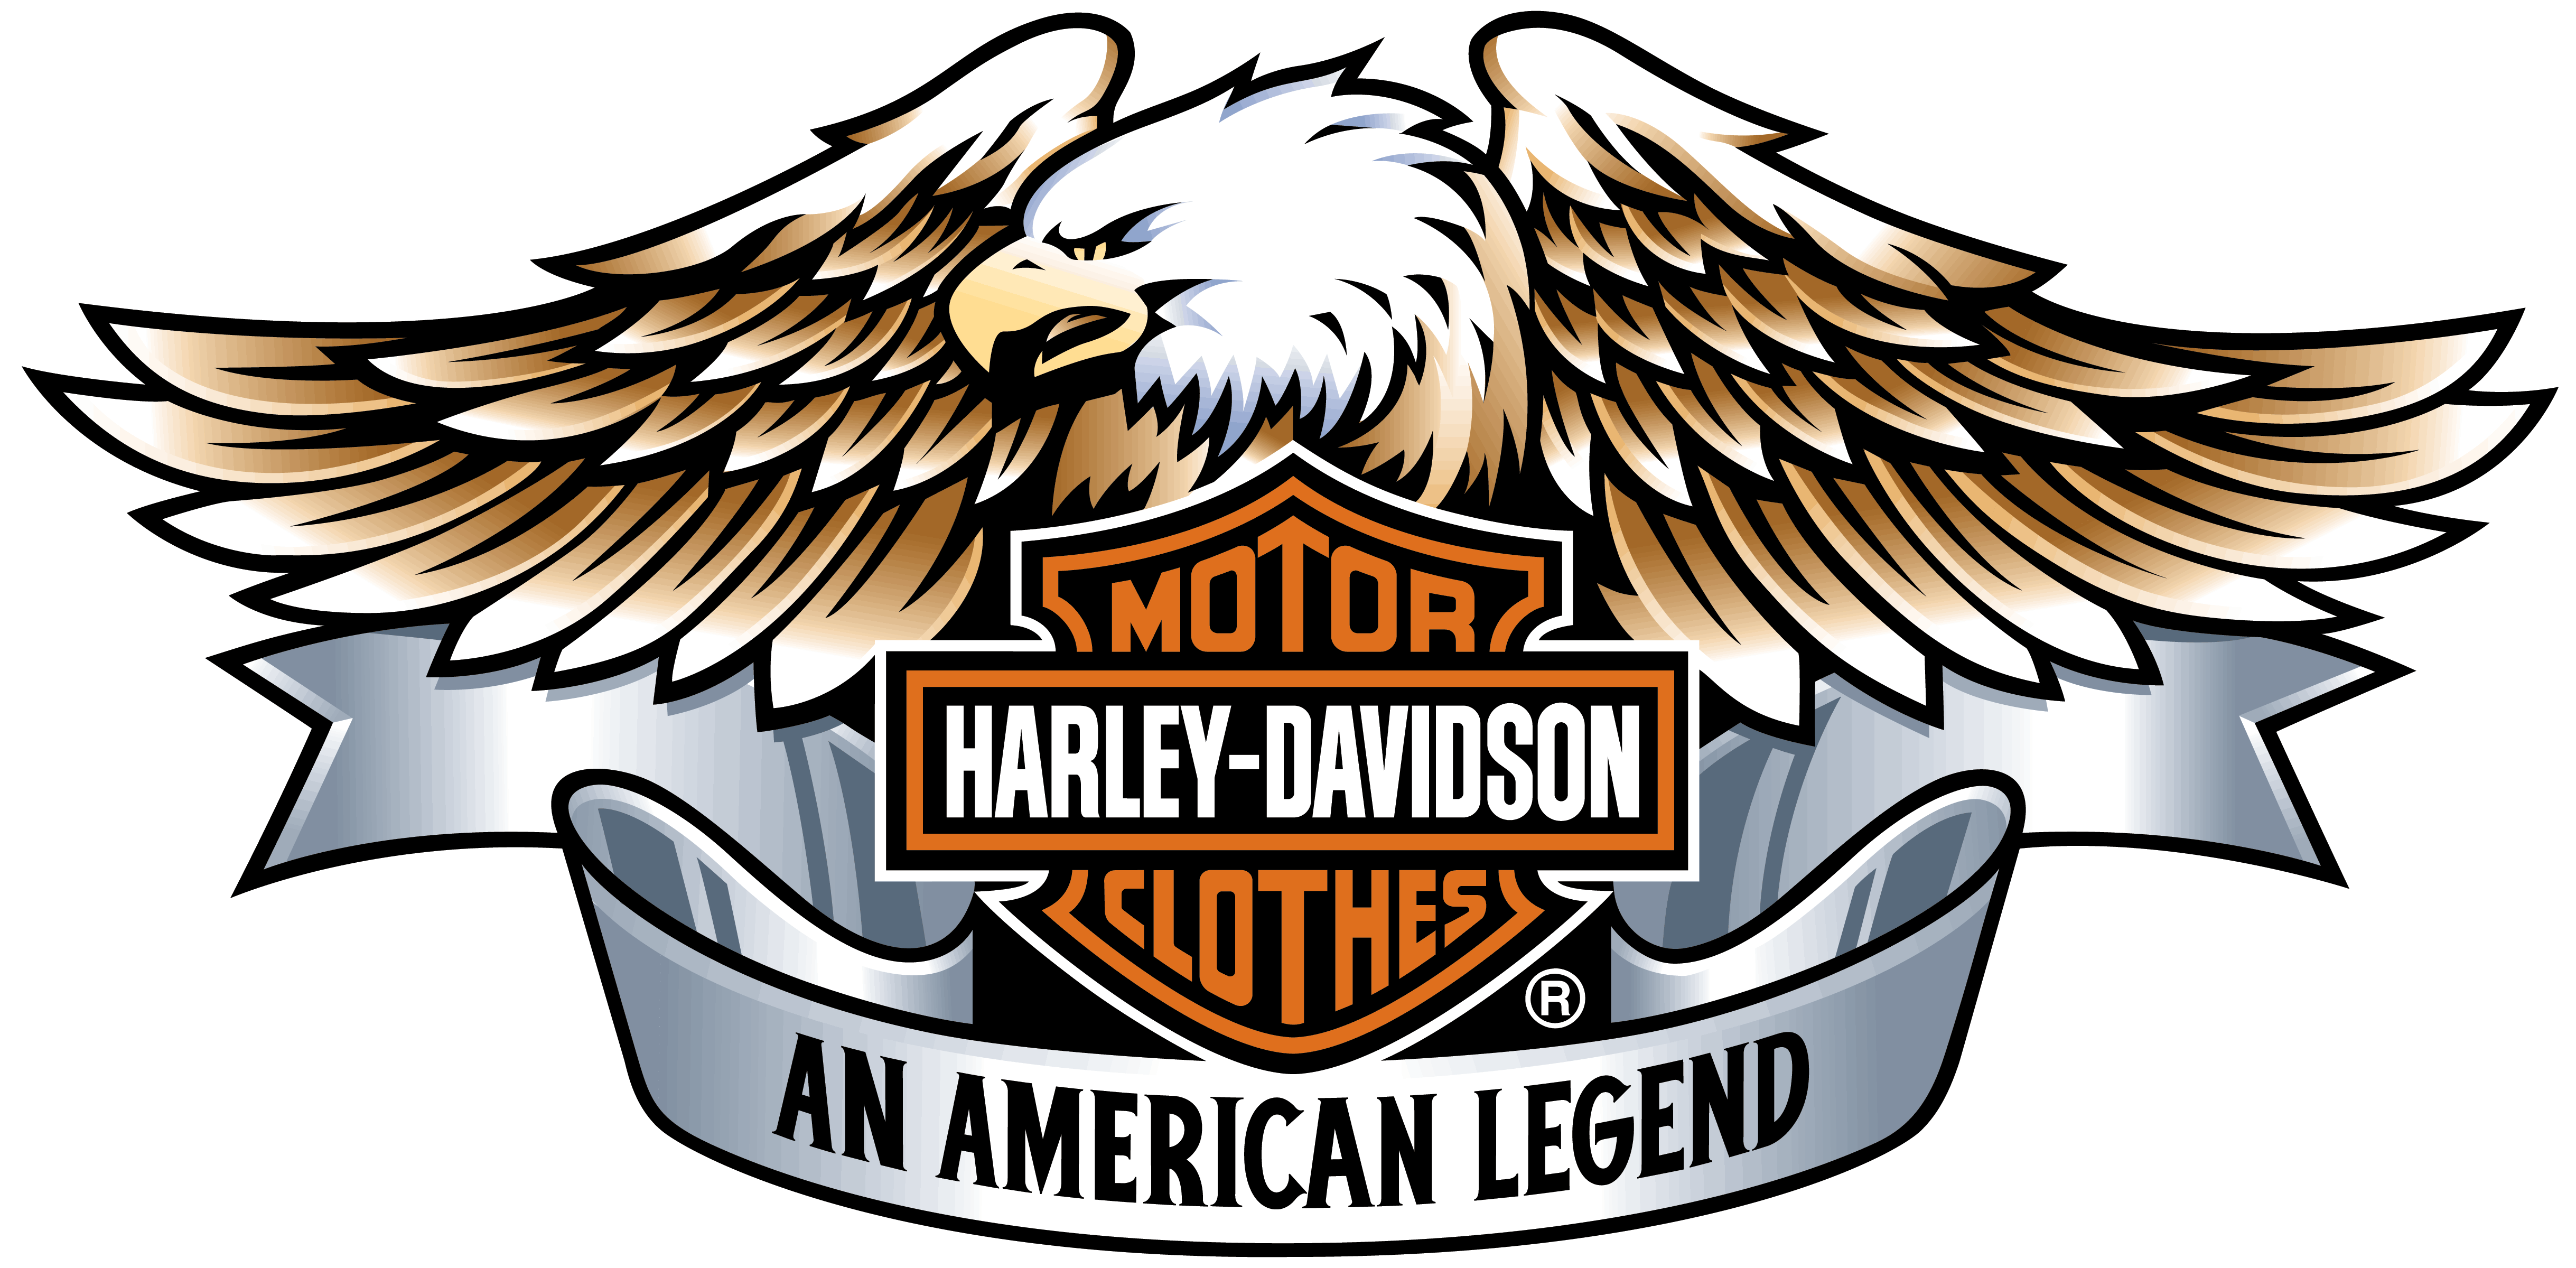 Milwaukee Wi Harley Davidson Wallpaper Harley Davidson Harley Davidson Logo